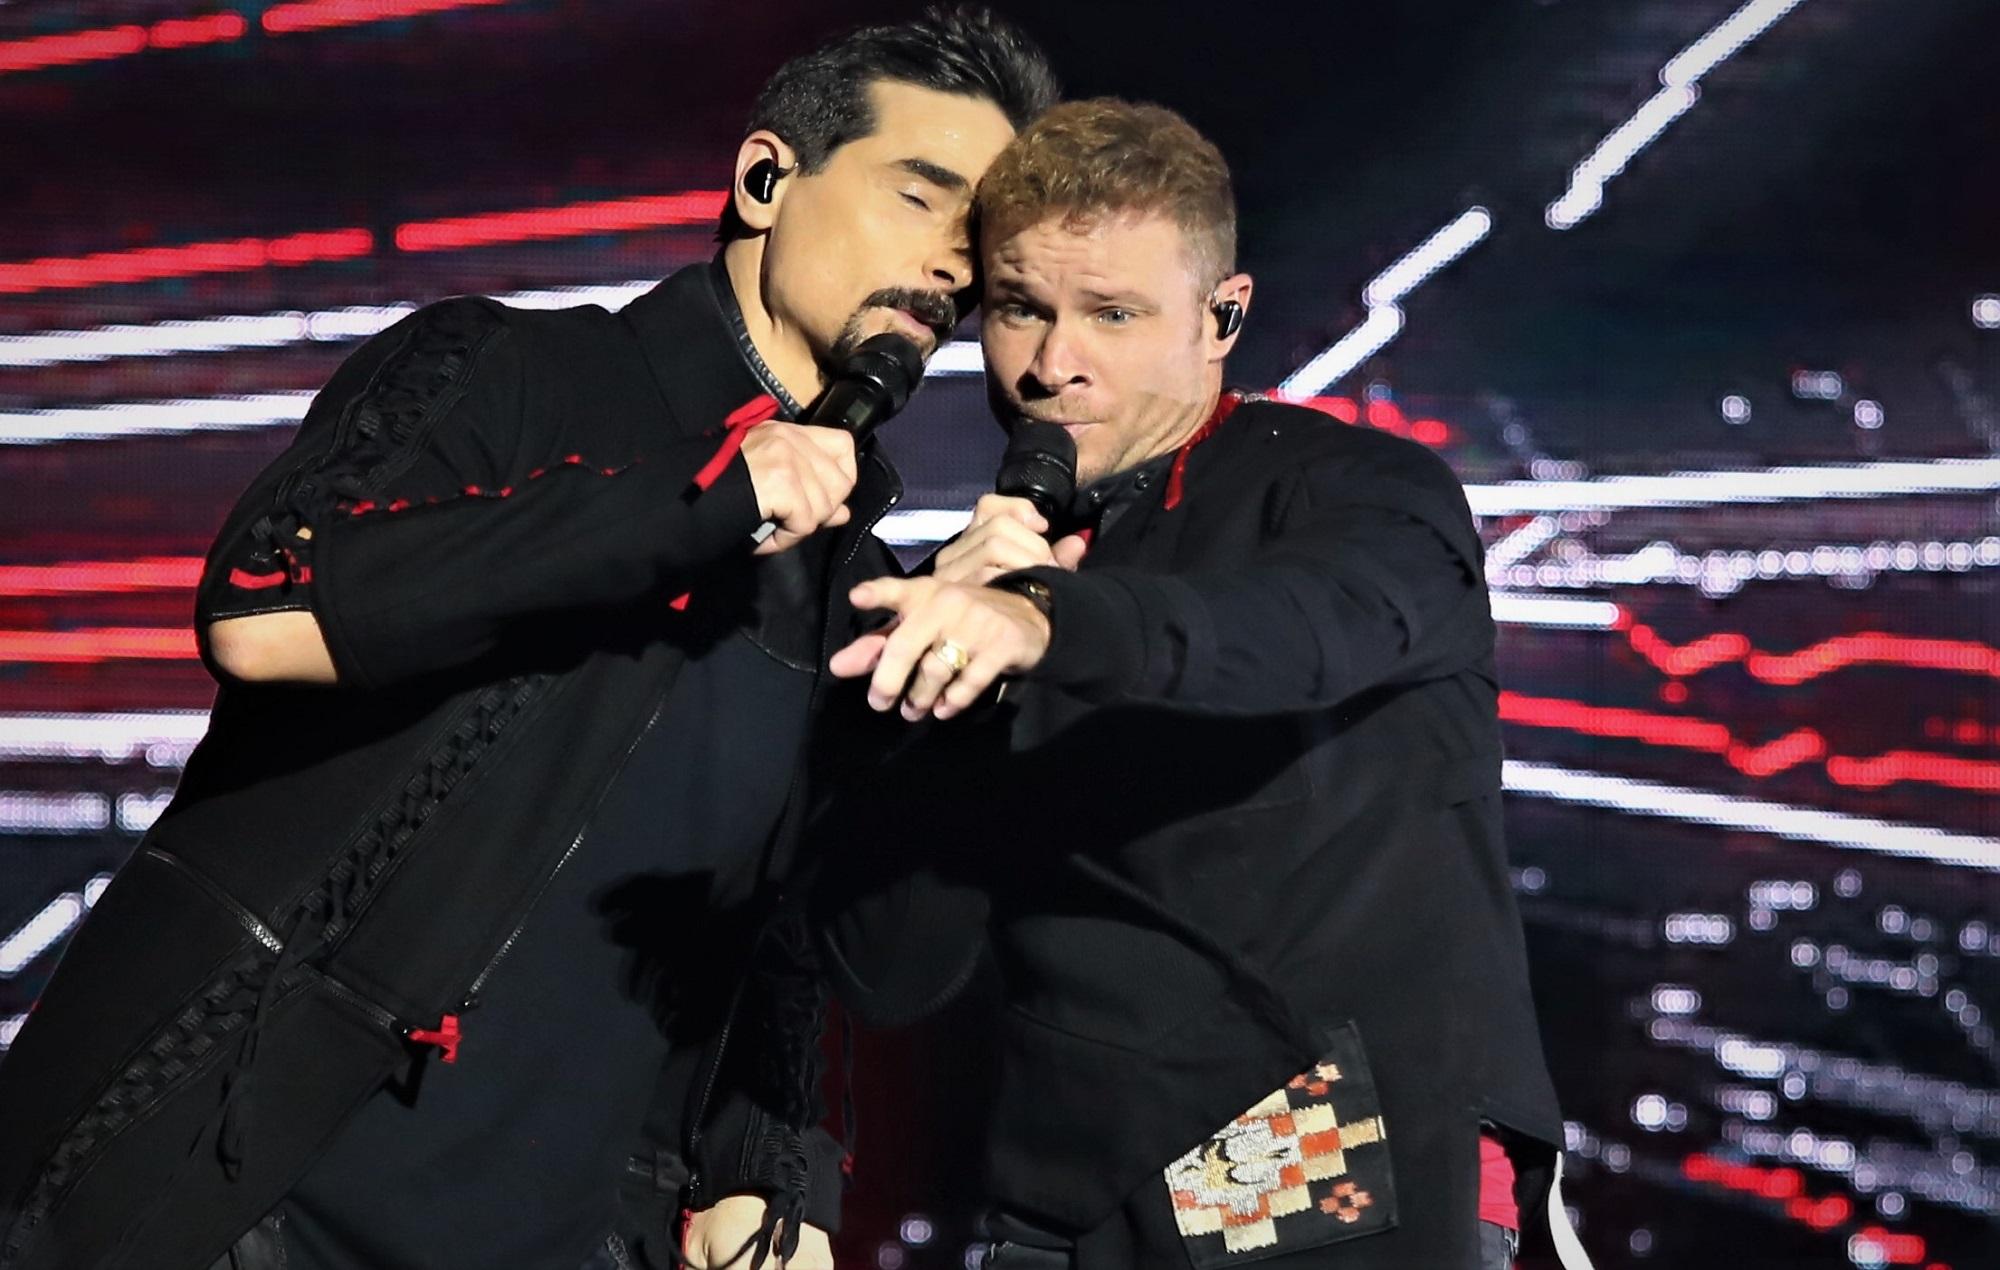 Backstreet Boys' Kevin Richardson posts cryptic tweet after bandmate Brian joins Parler